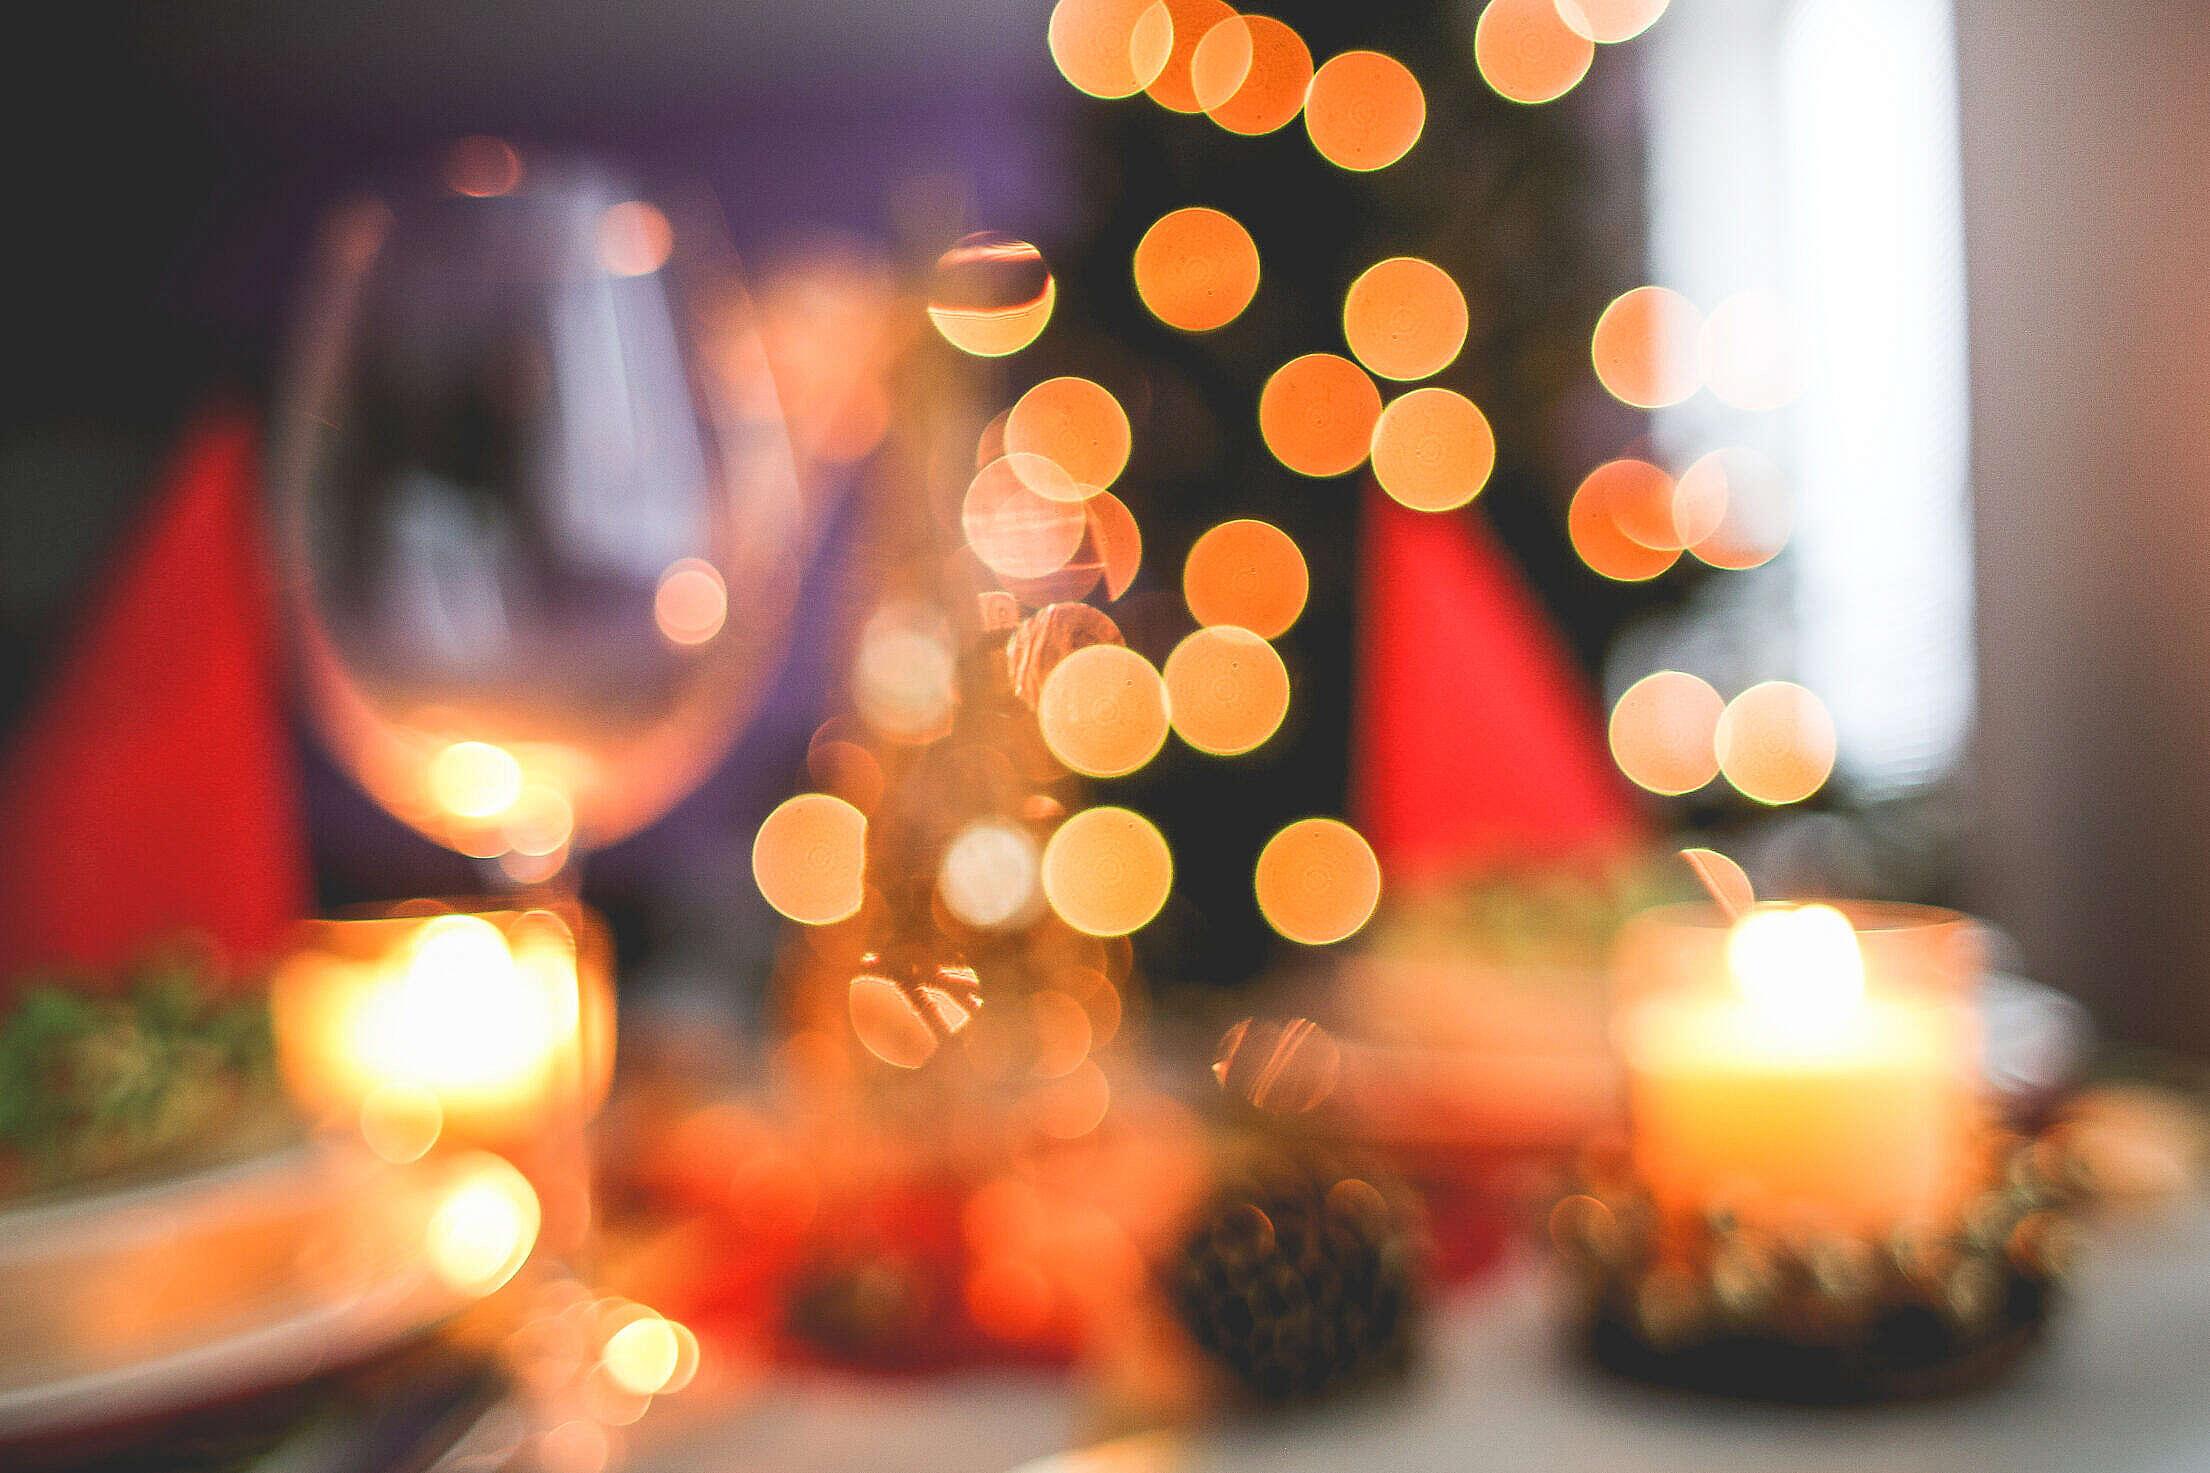 Blurred Christmas Tree Background Free Stock Photo